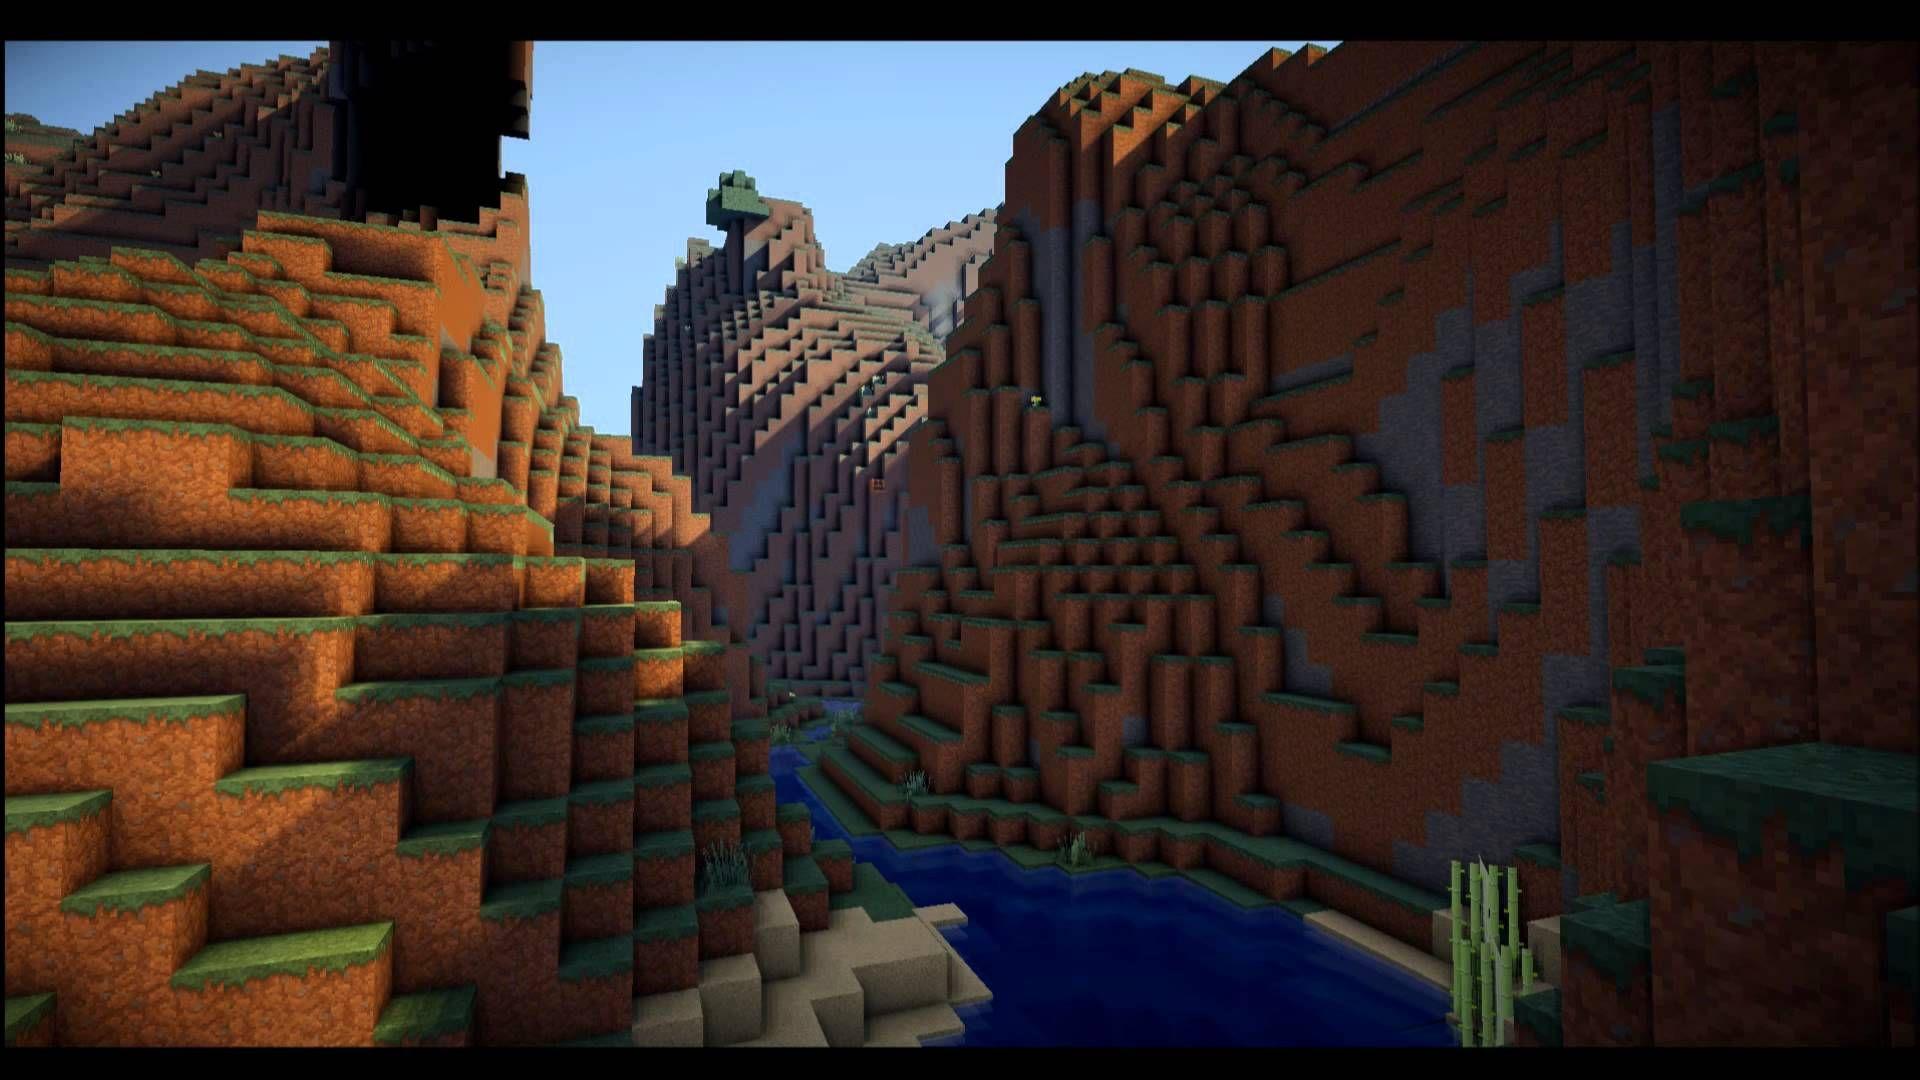 Wonderful Wallpaper Minecraft Youtube - 64ae80fc018619cdd4362107d198b50b  Pictures_345626.jpg